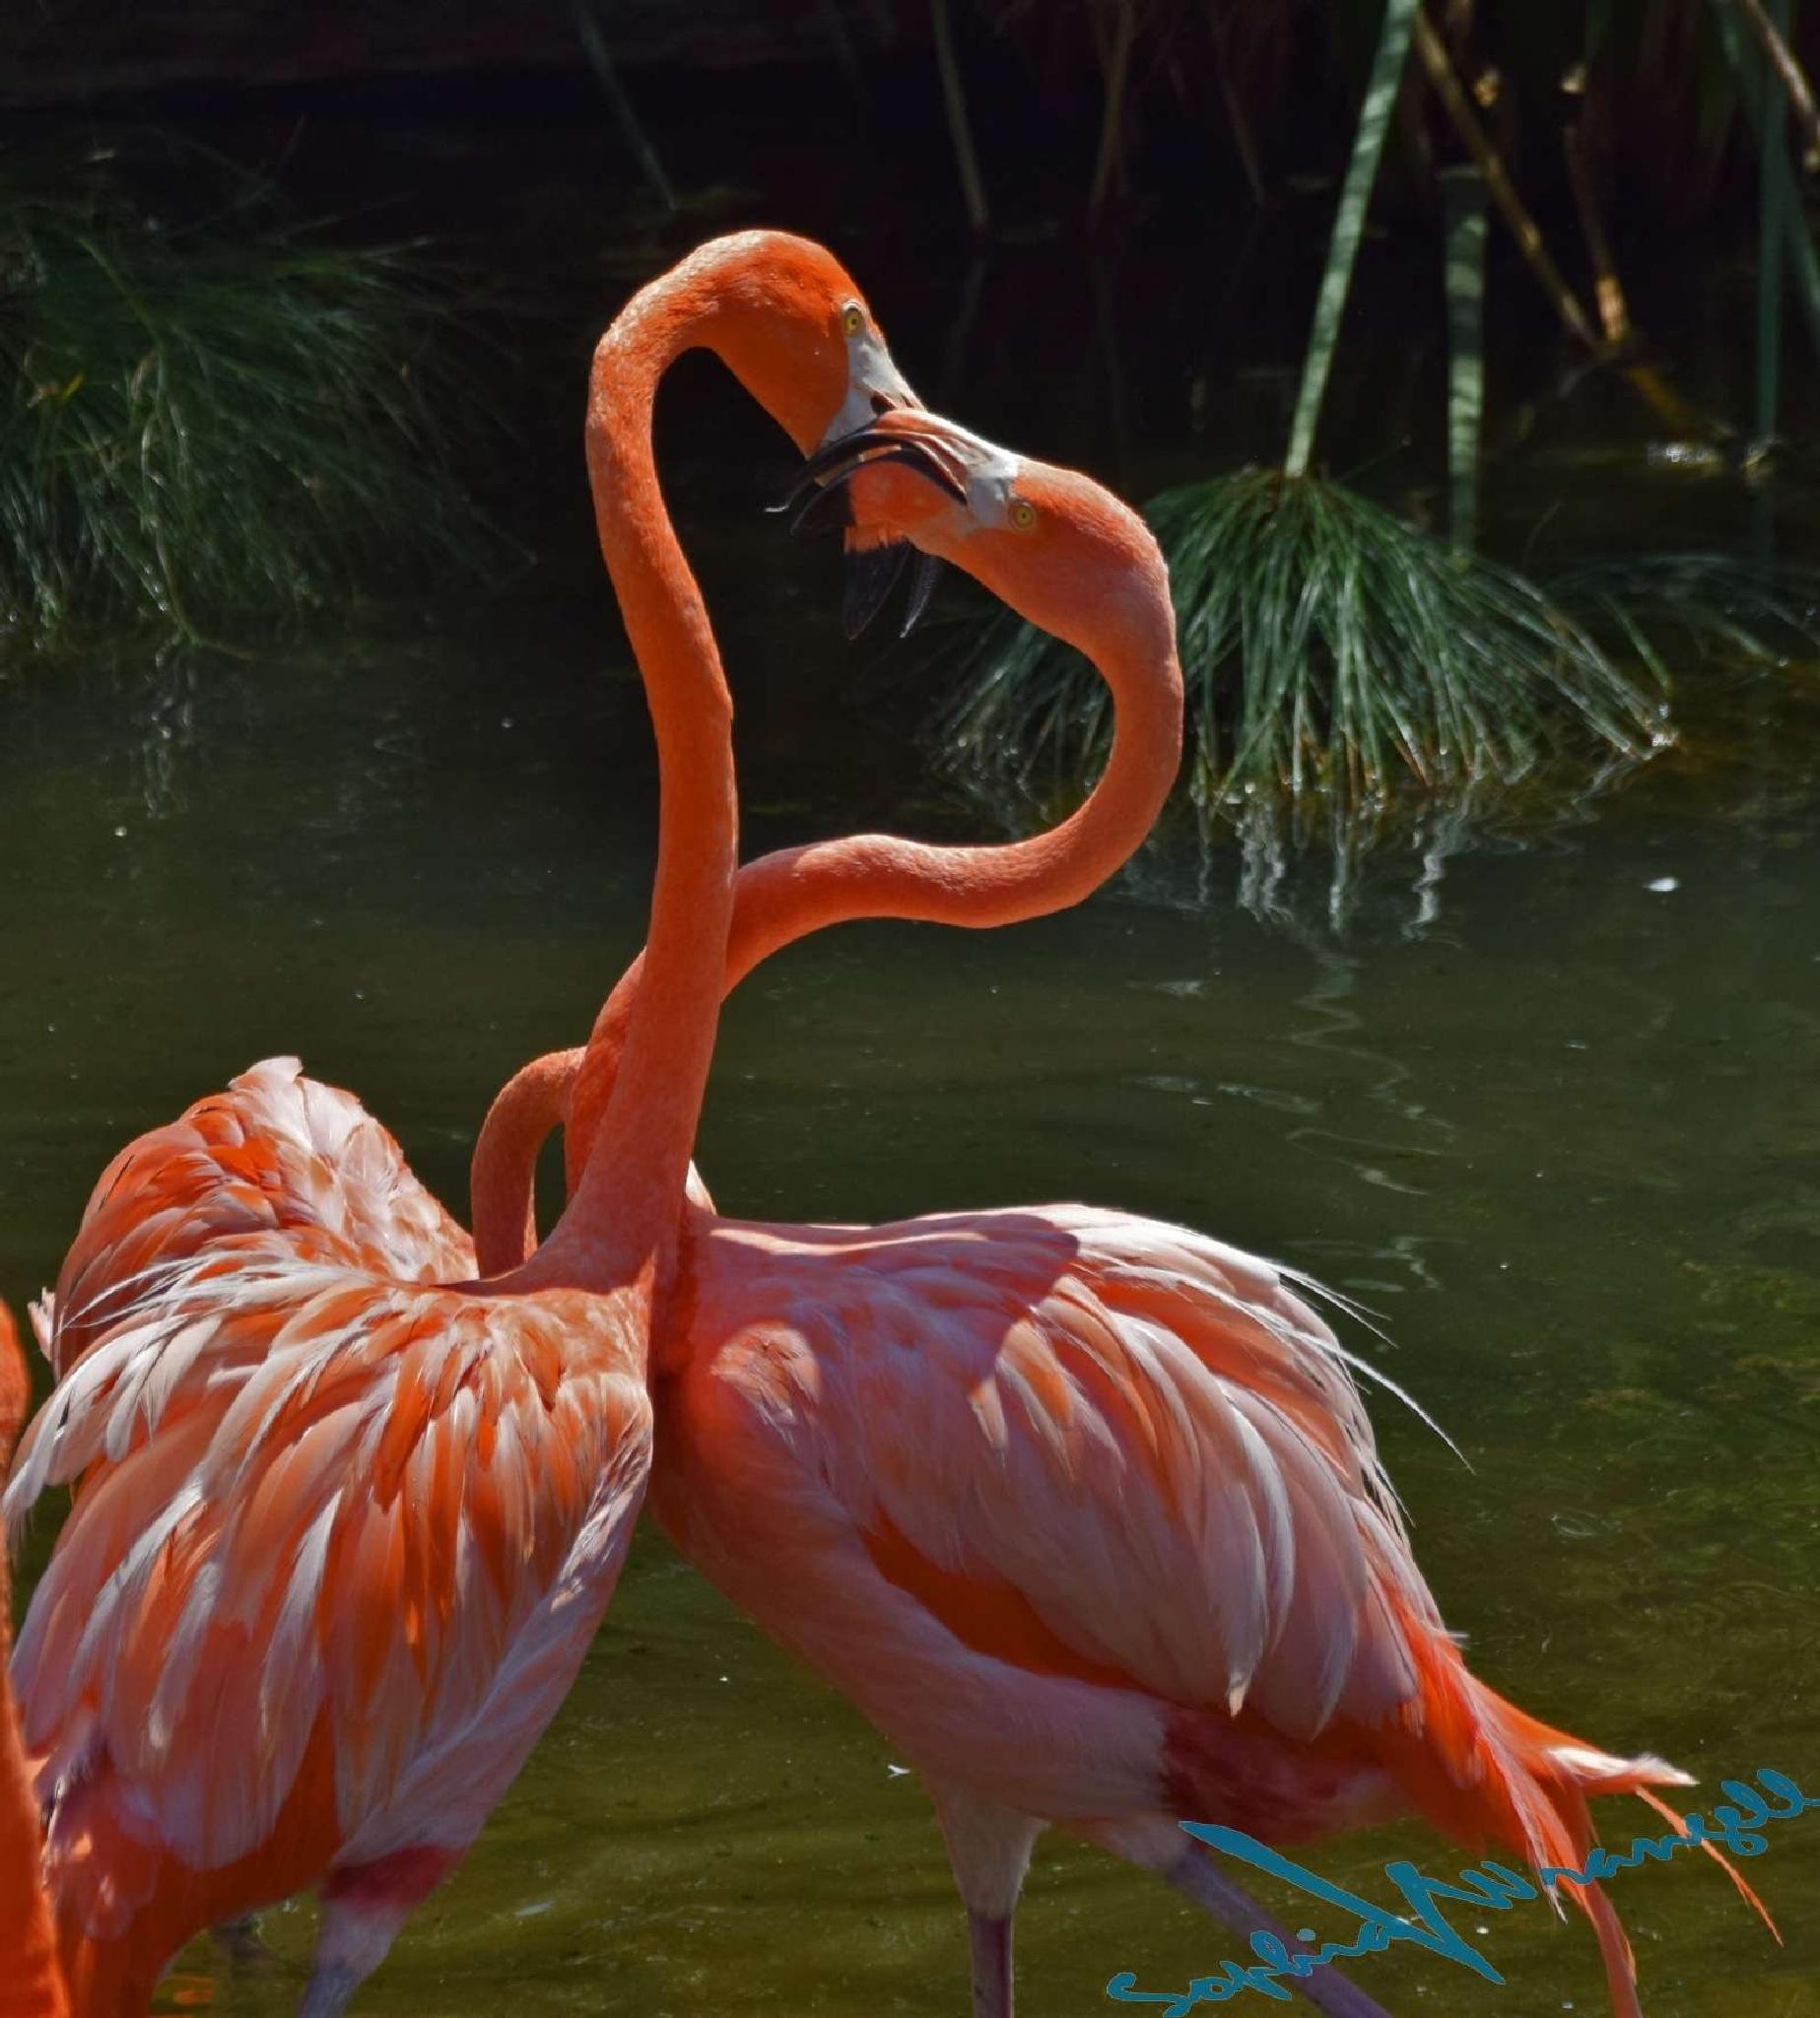 Flamingos fighting by Sophia von Wrangell